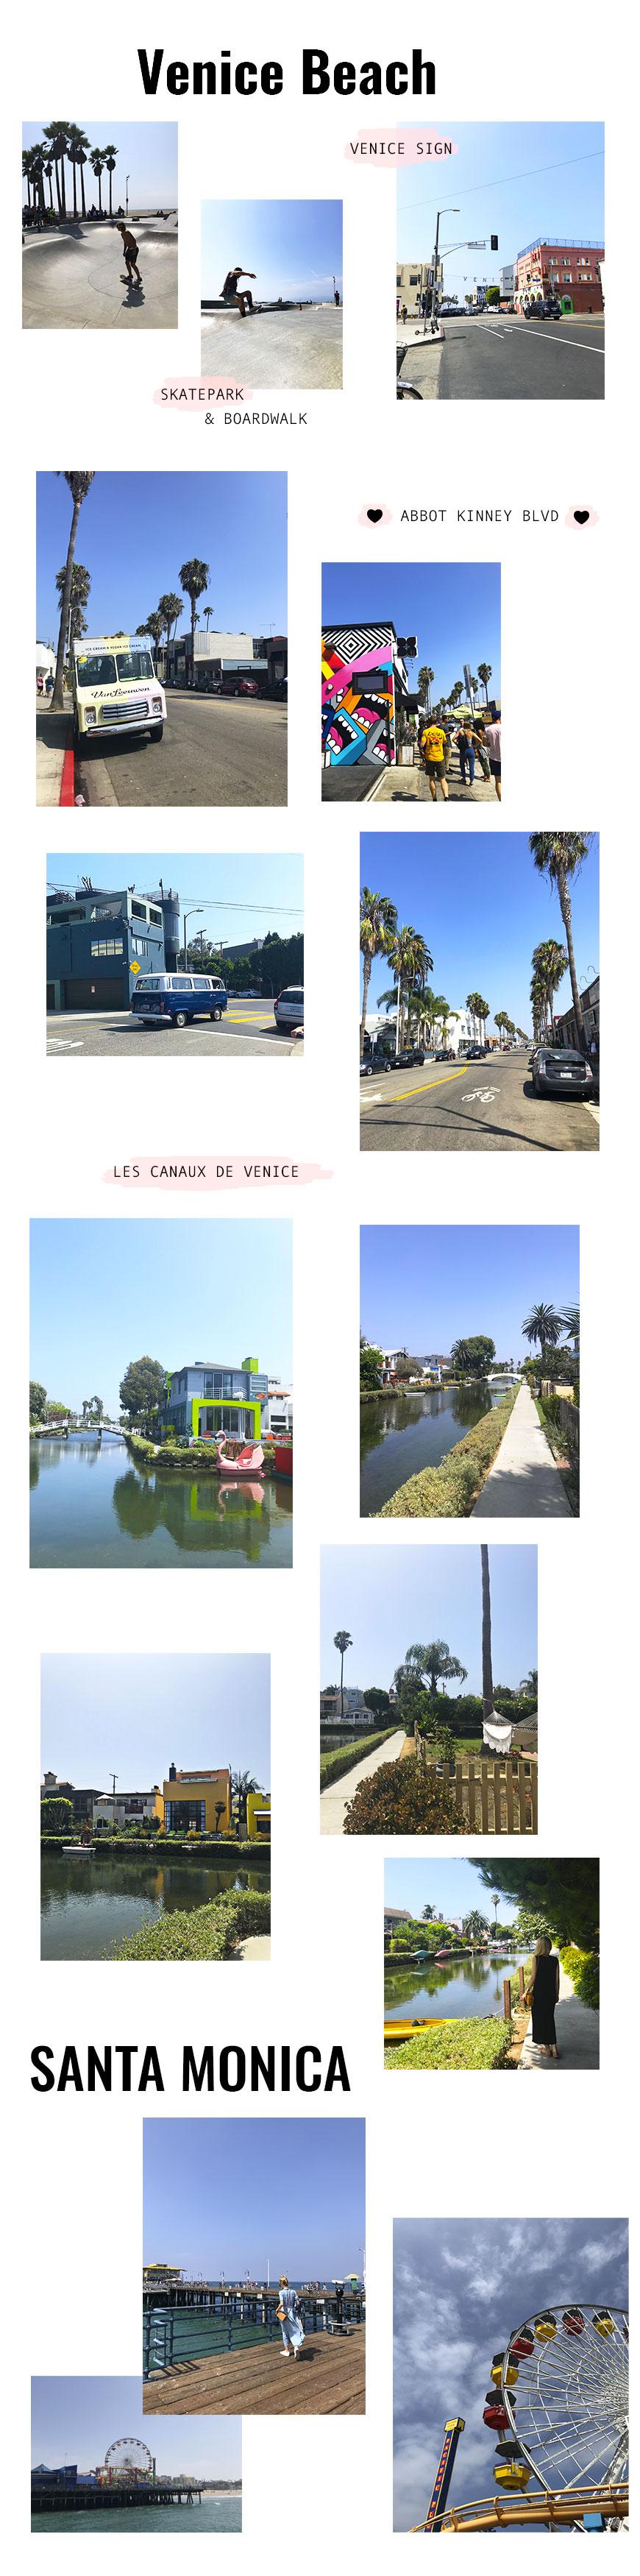 Venice-beach-adresse mademoiselle claudine